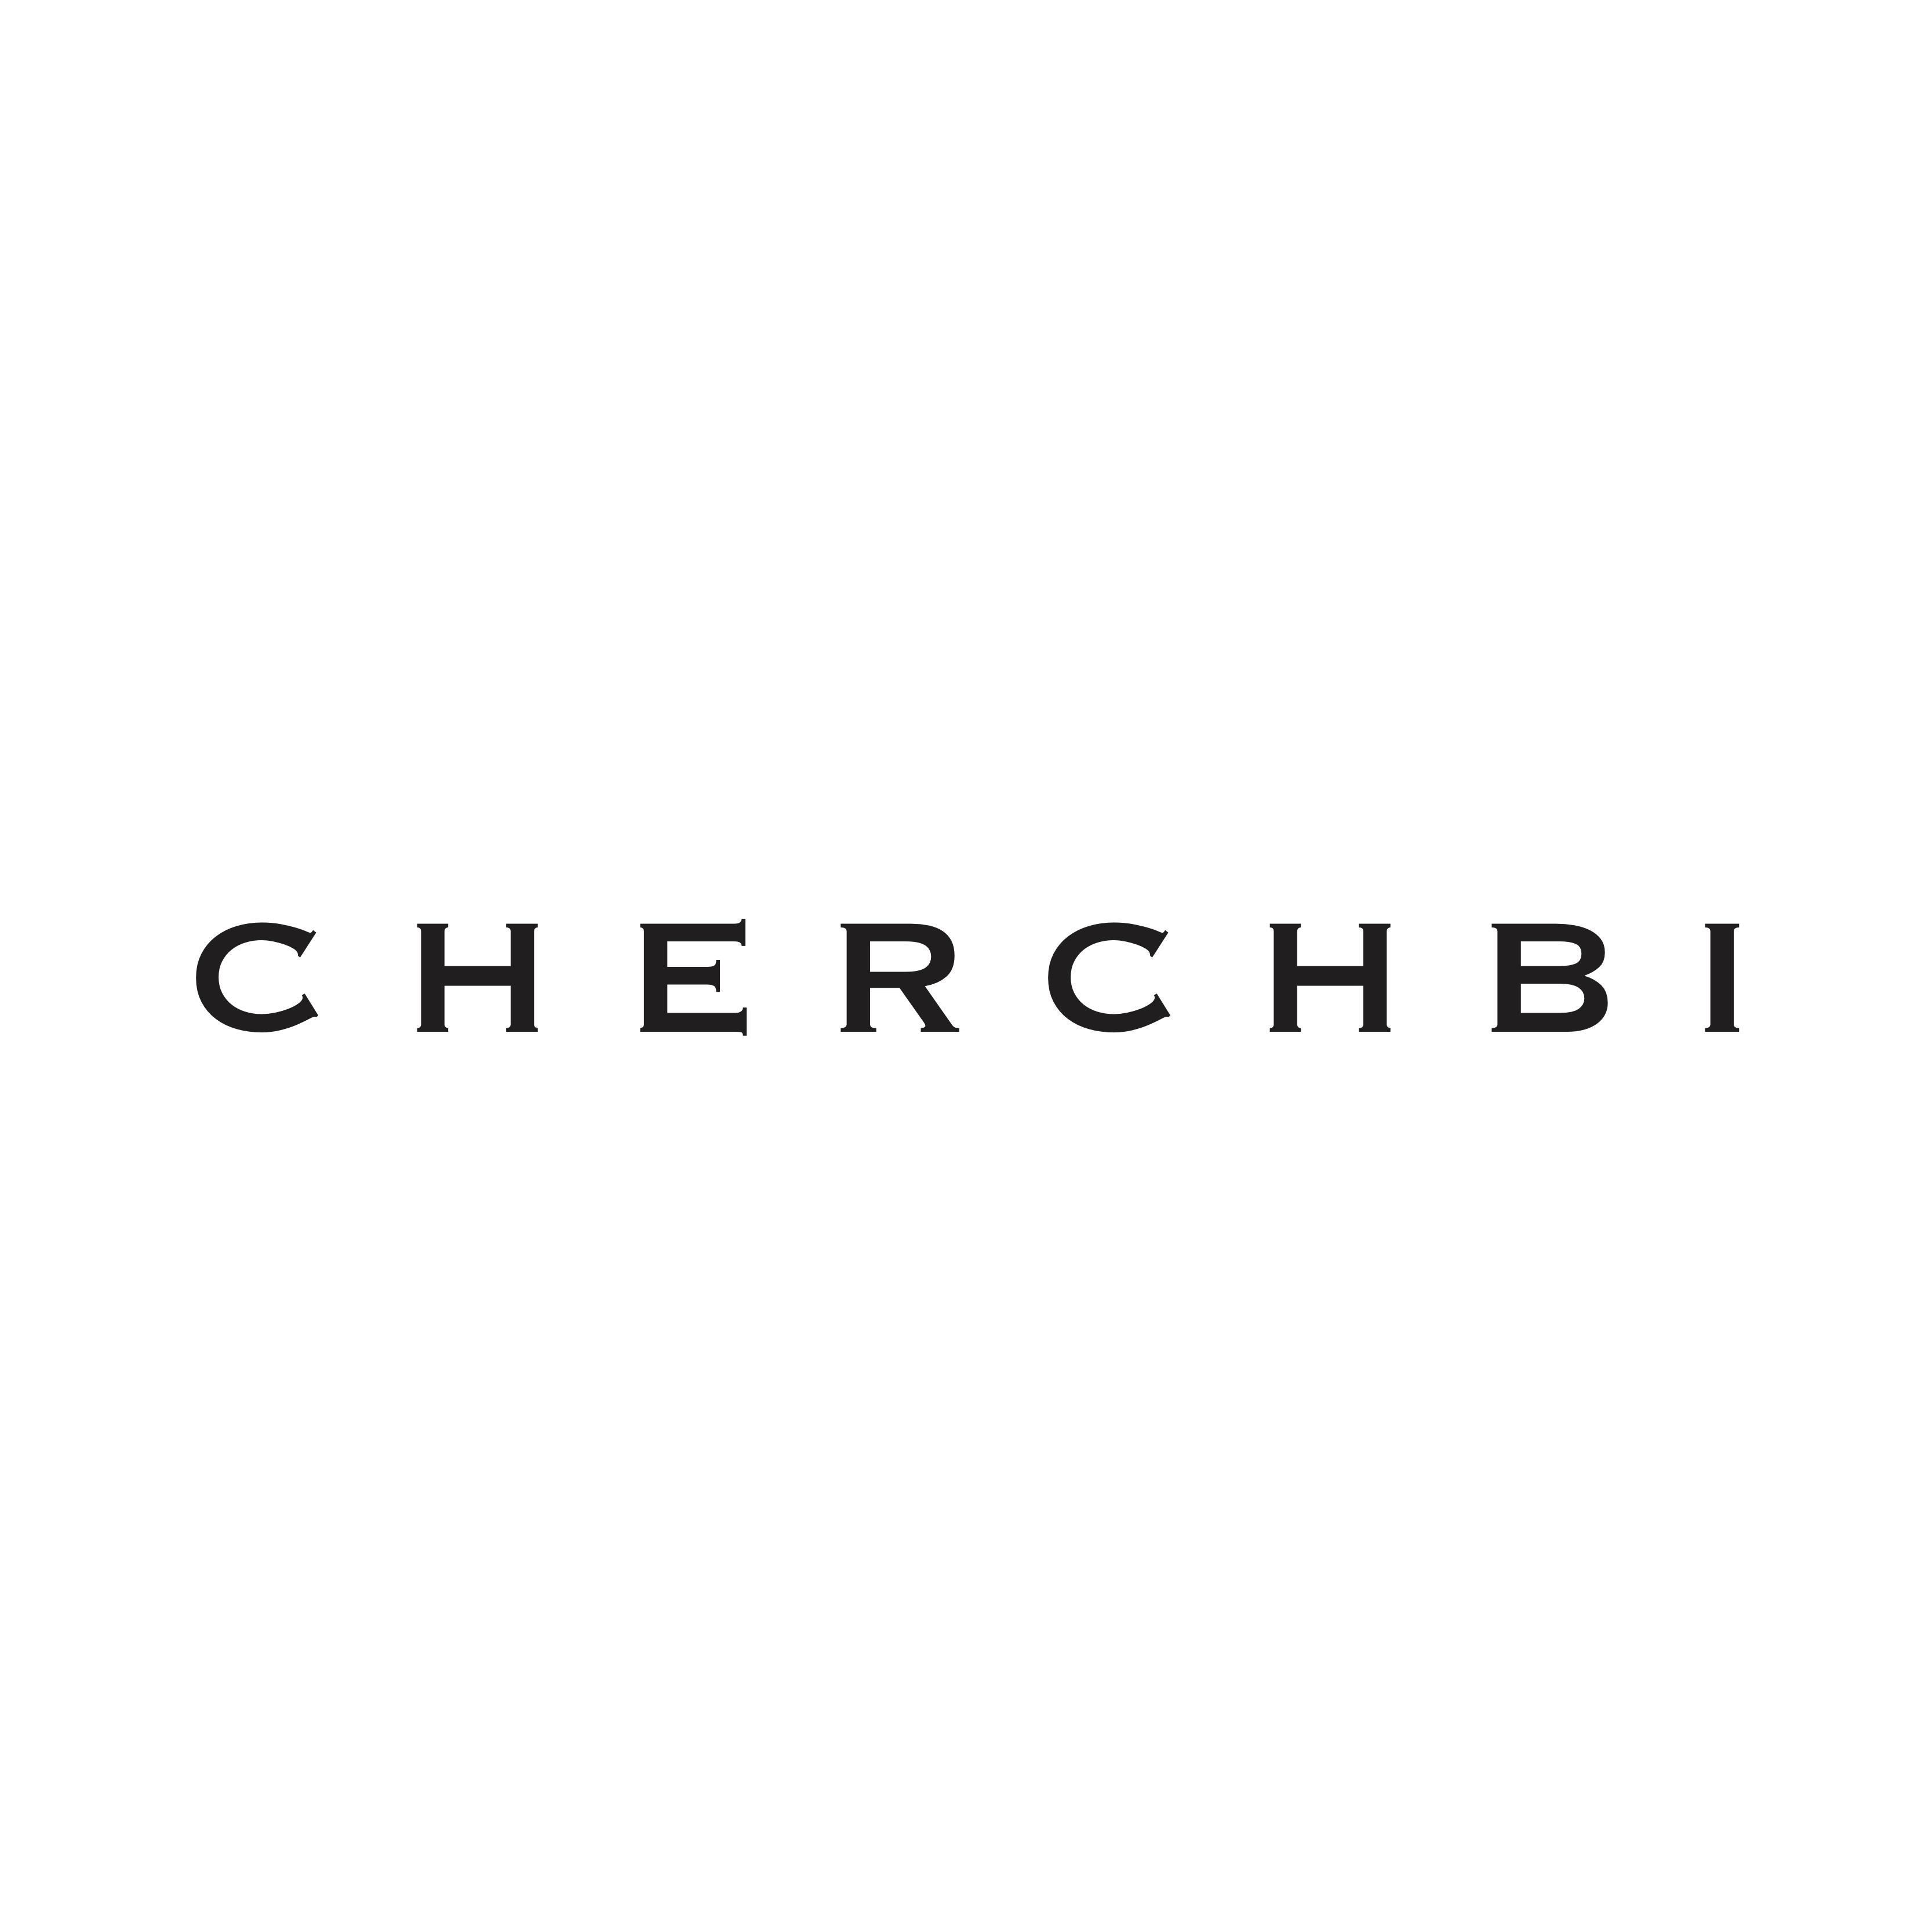 CHERCHBI LOGO